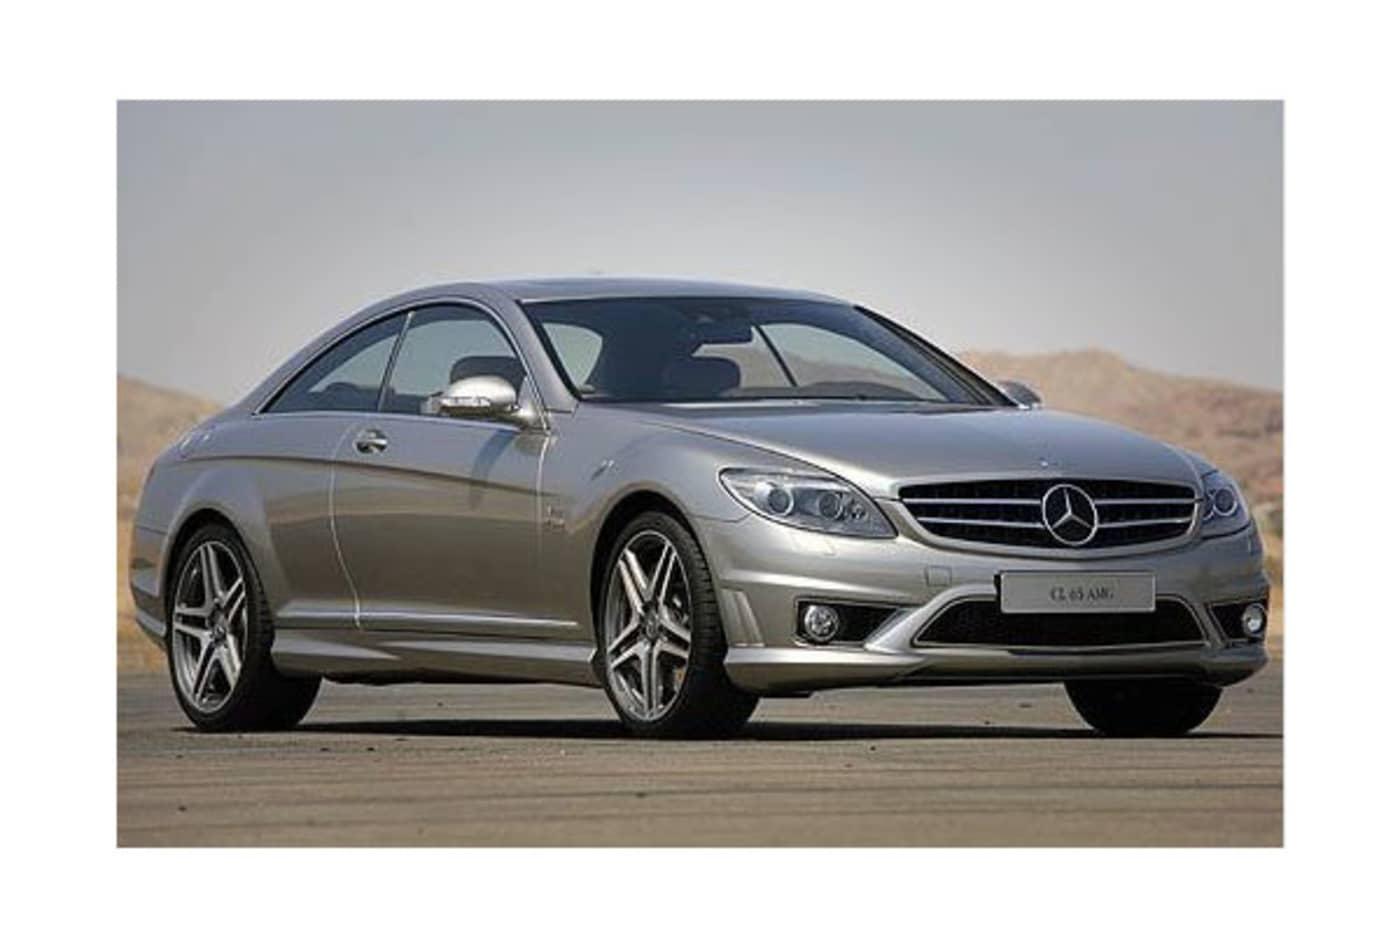 48438692 Mercedes-Benz-CL-Most-Stolen-Luxury-Cars-CNBC.jpg